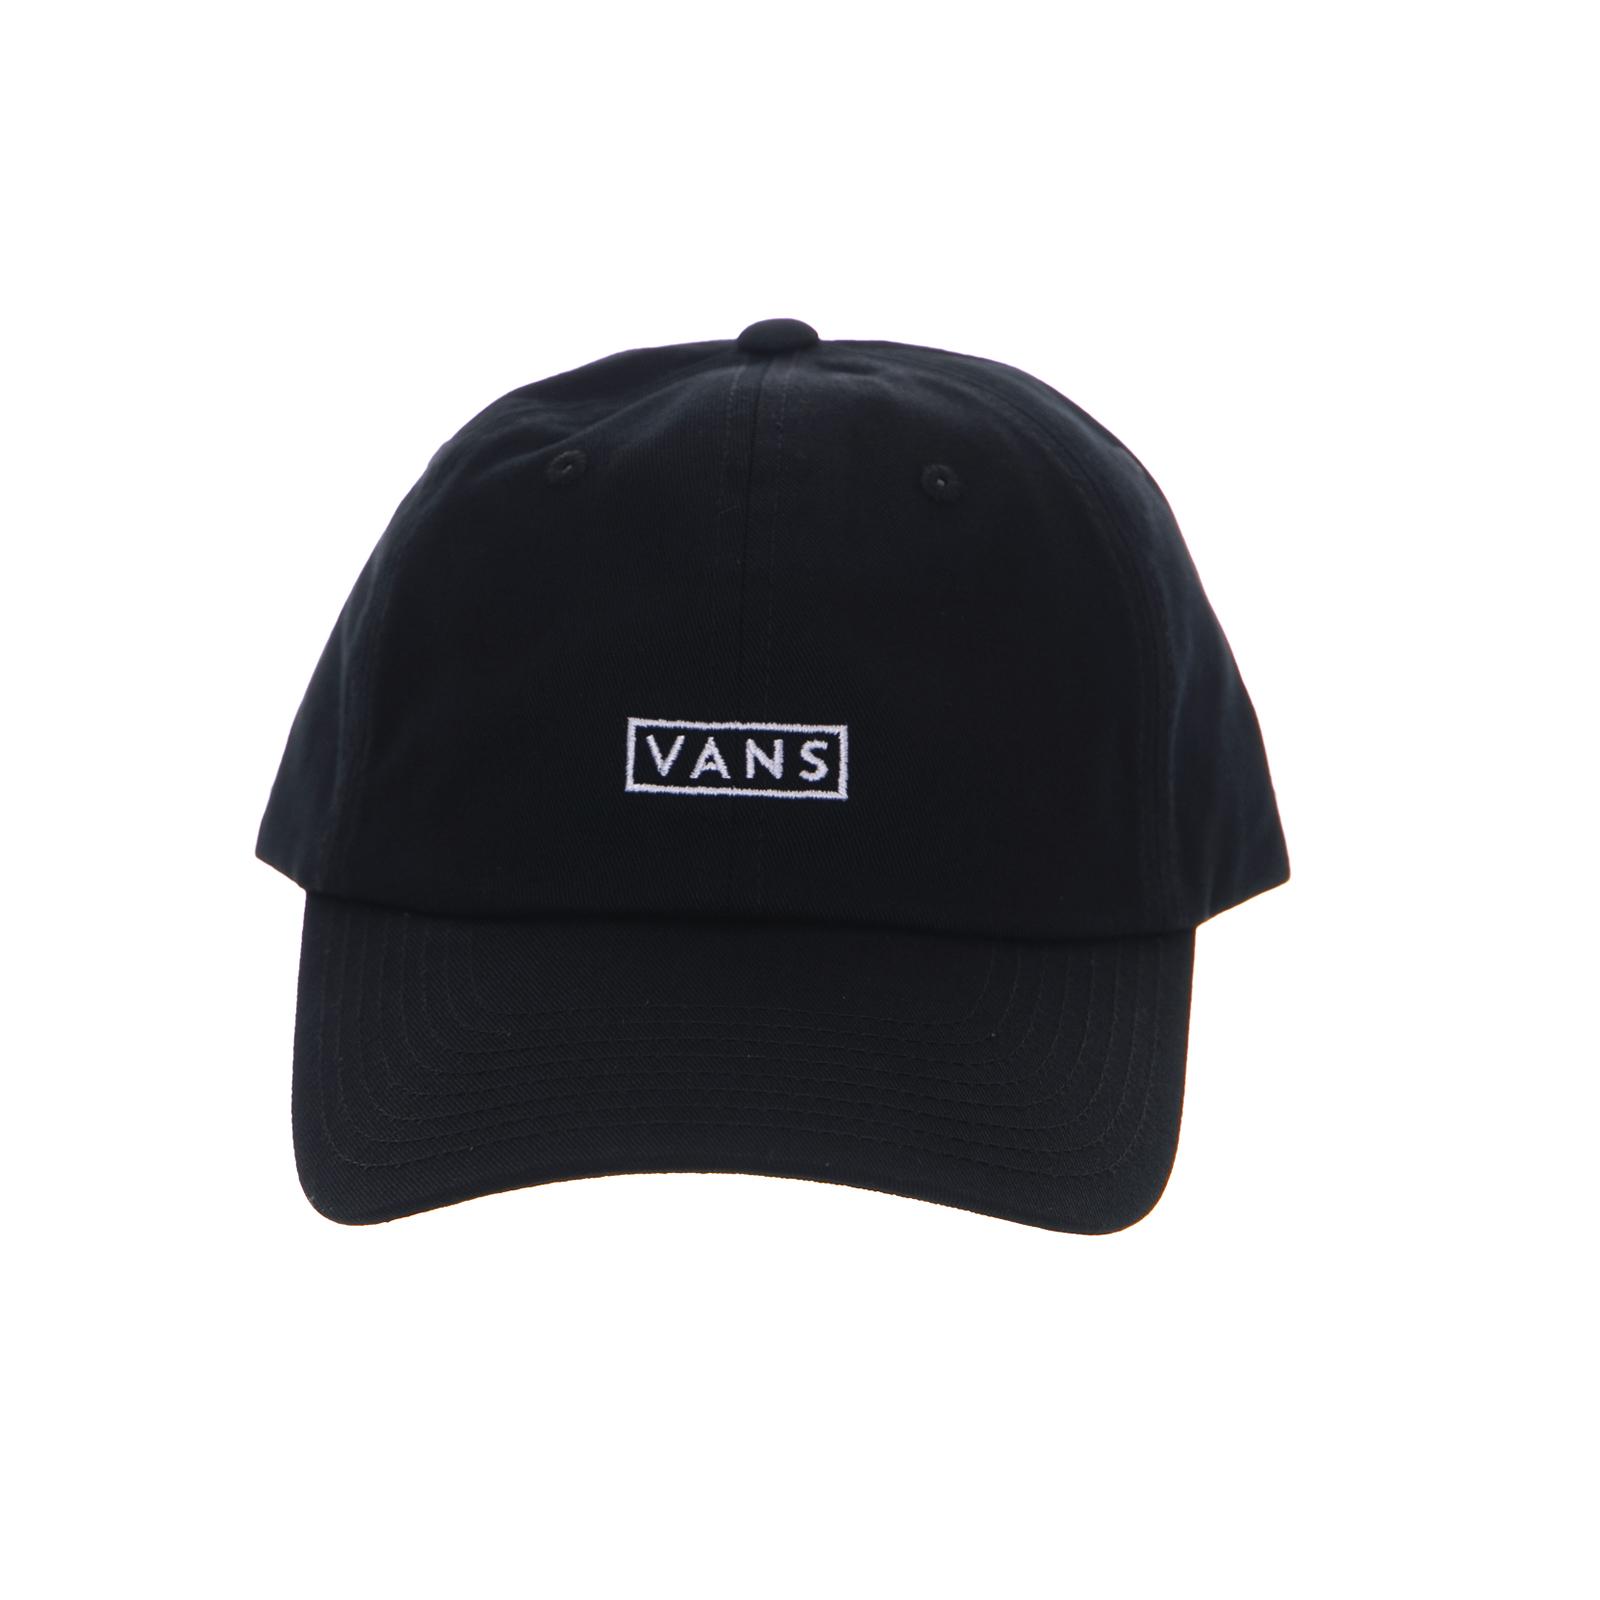 4f62aed26f5 Vans cappelli mn vans curved bill black nero